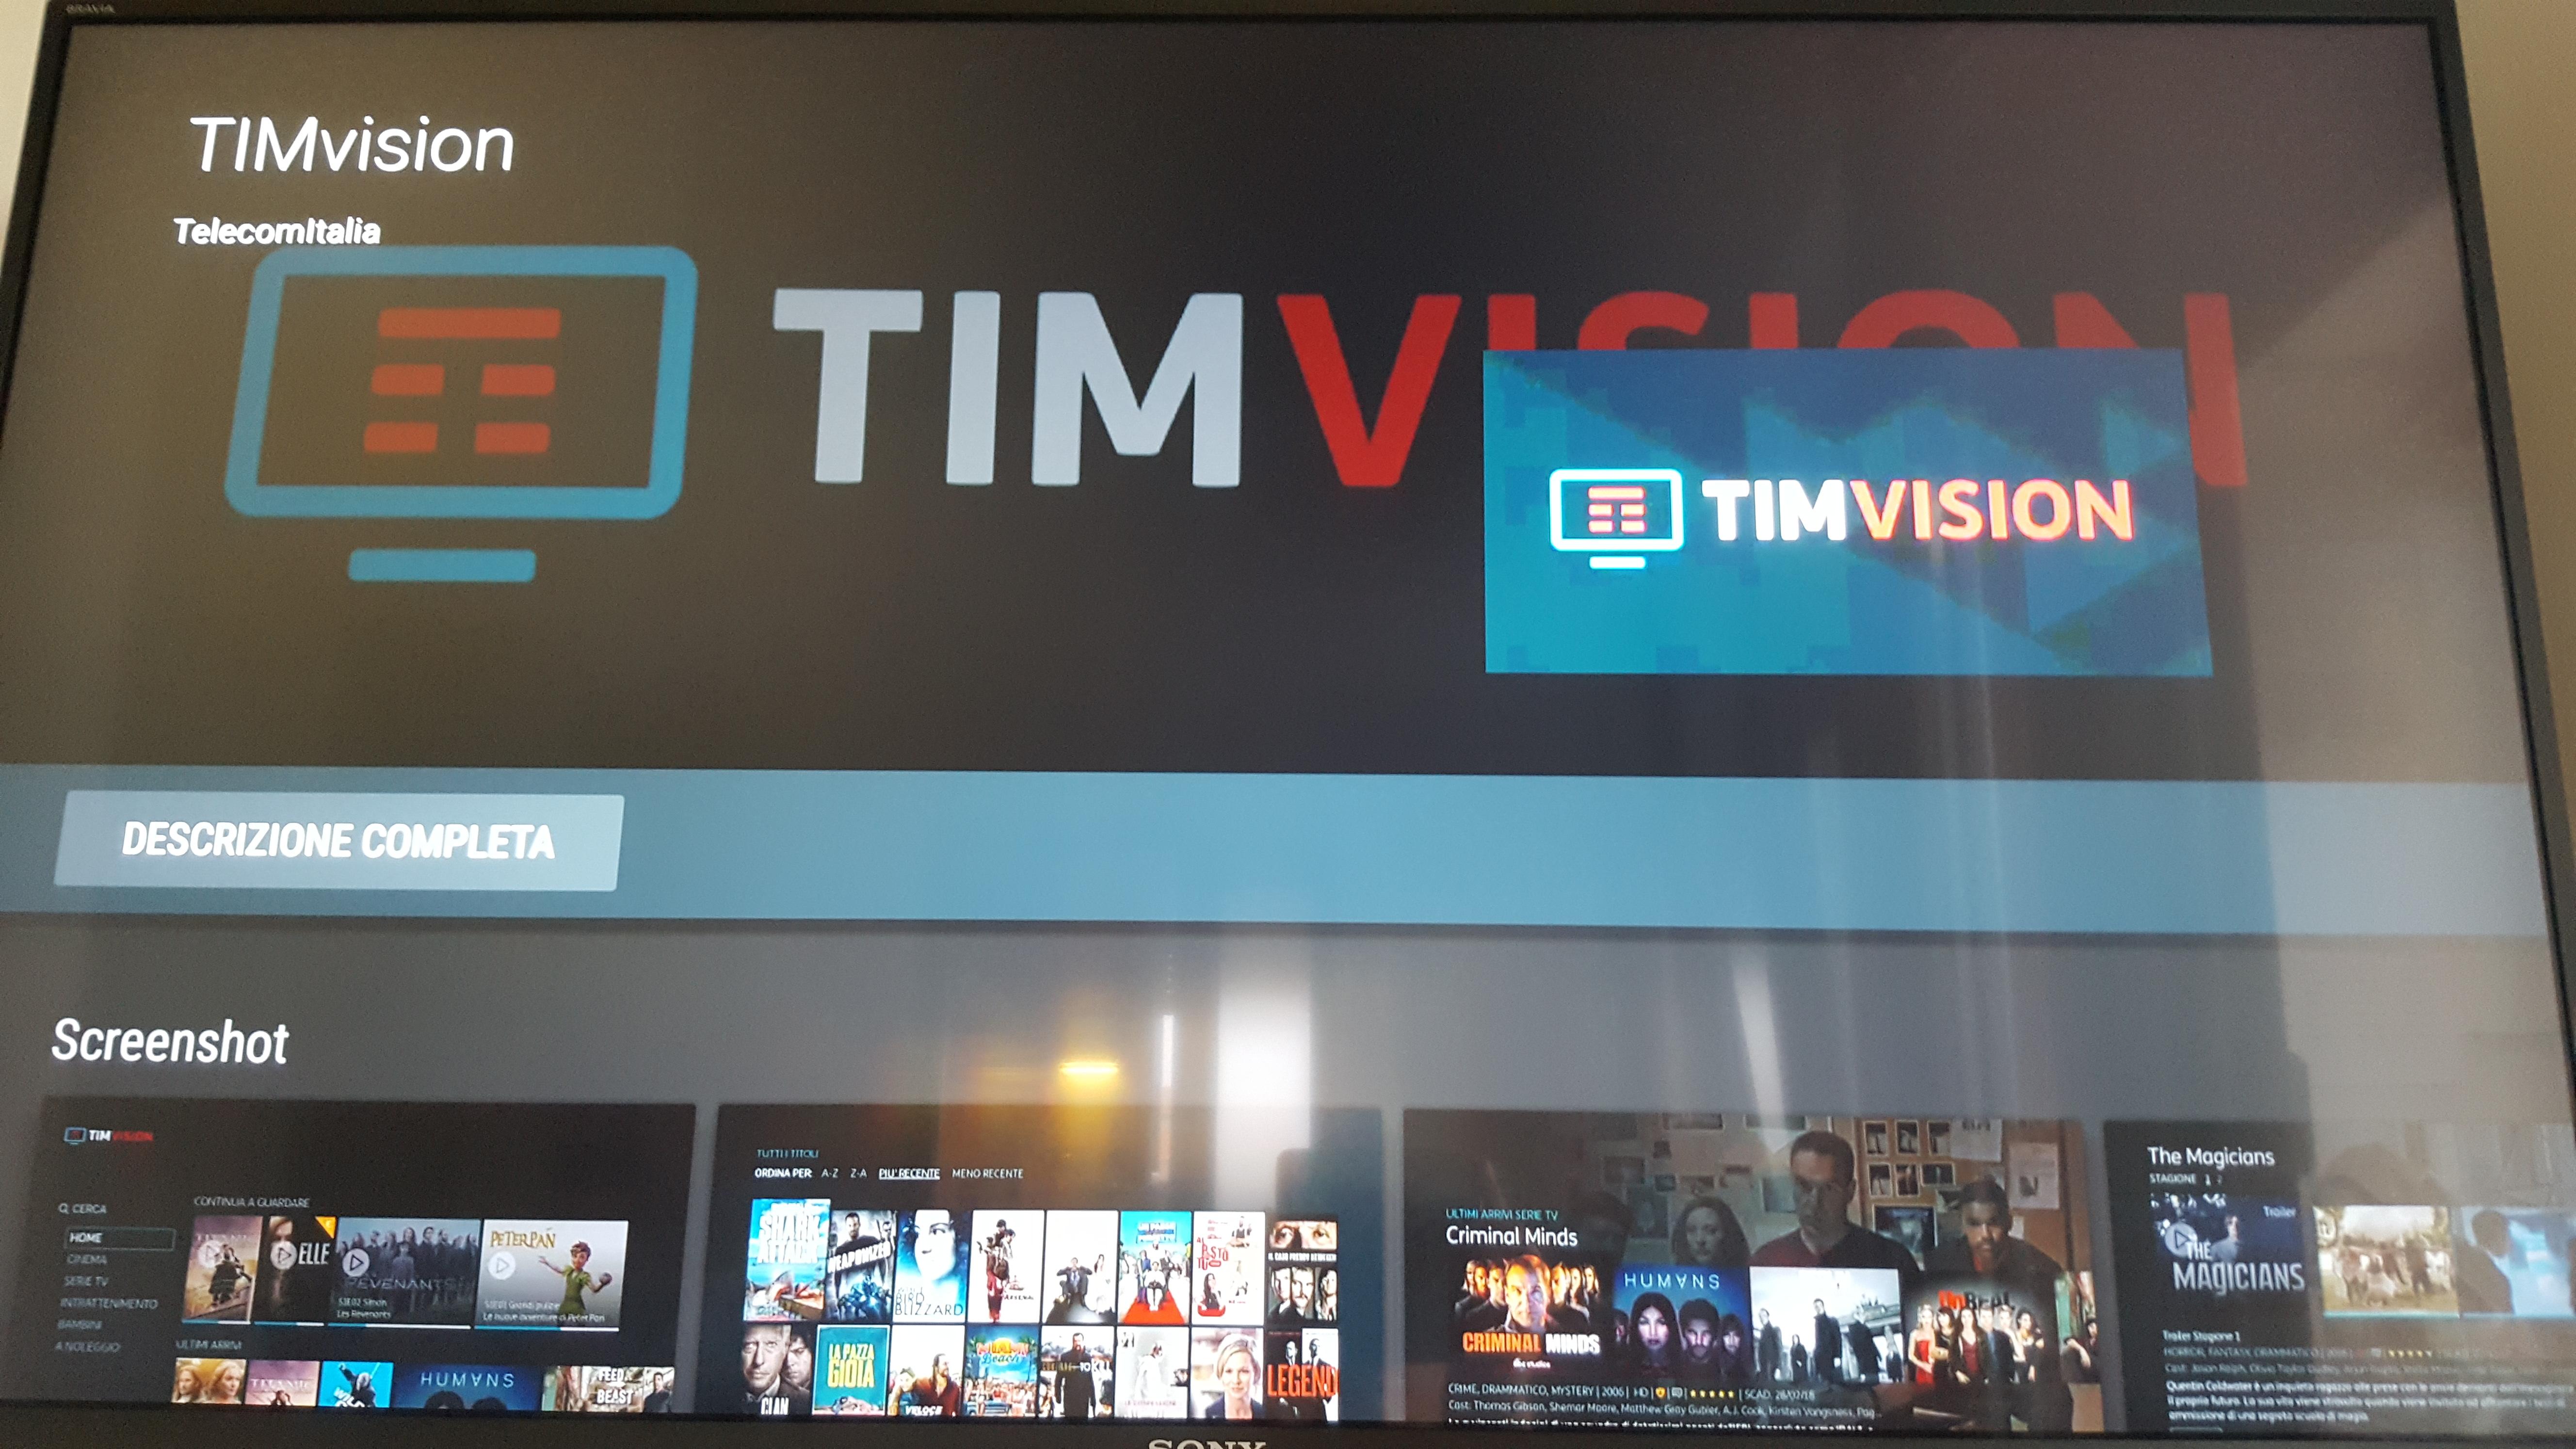 installare app su smart tv samsung